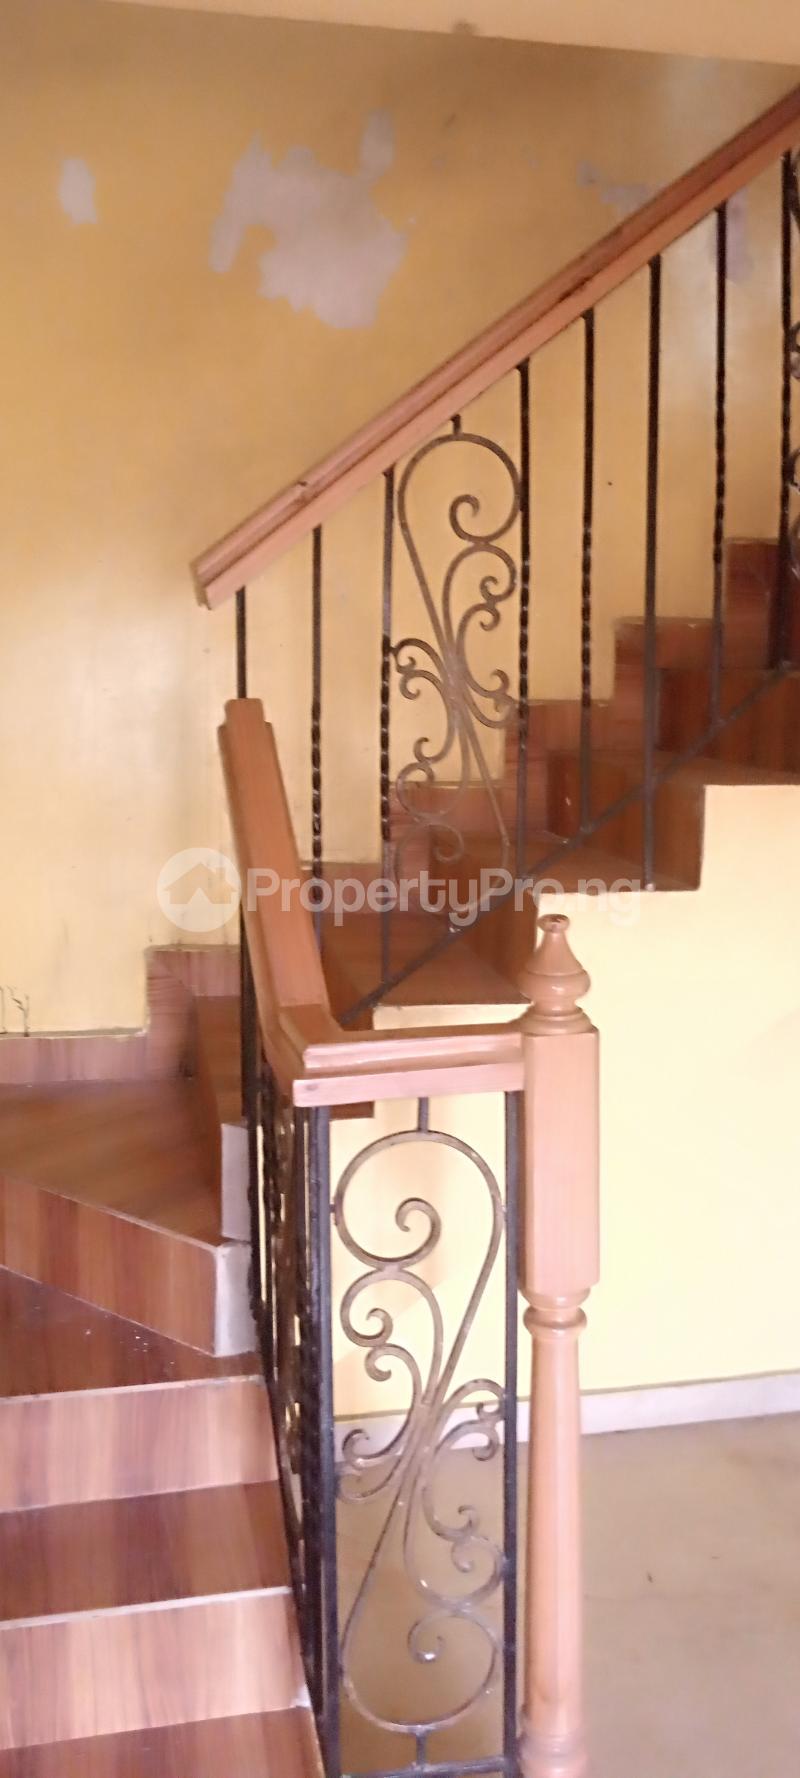 5 bedroom House for rent Estate drive Omole phase 2 Ojodu Lagos - 8